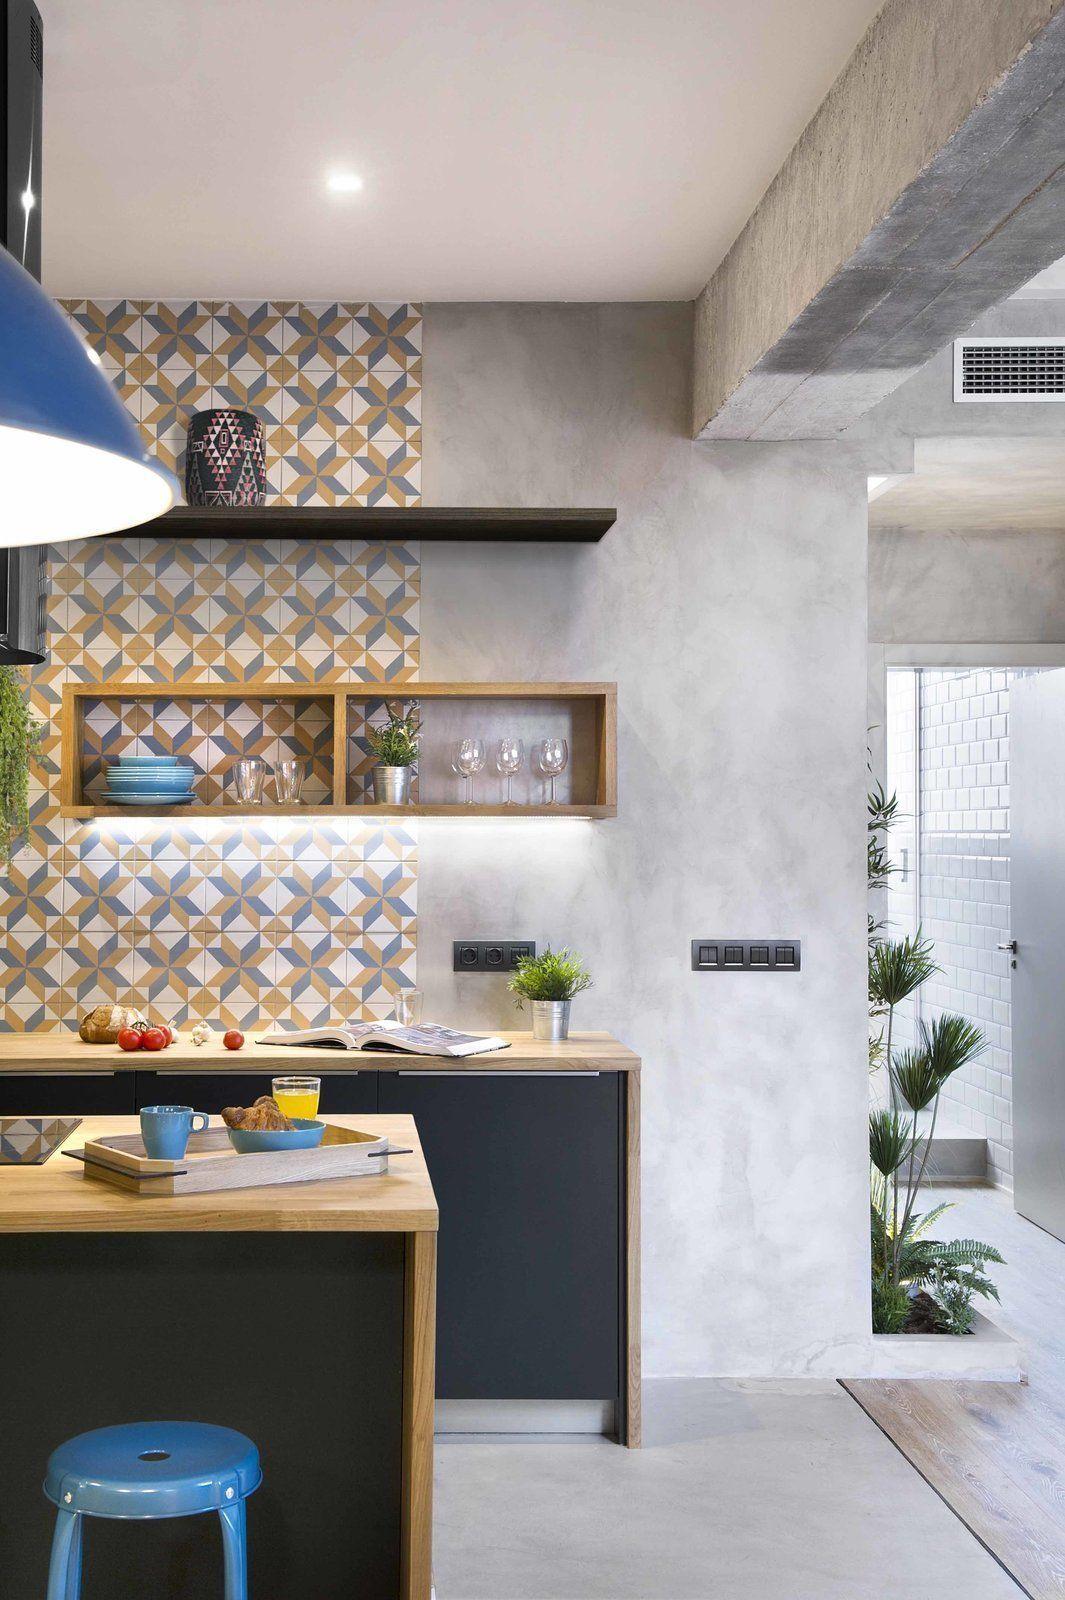 12 Brilliant Kitchen Backsplash Ideas Cozinhas Modernas Ideias